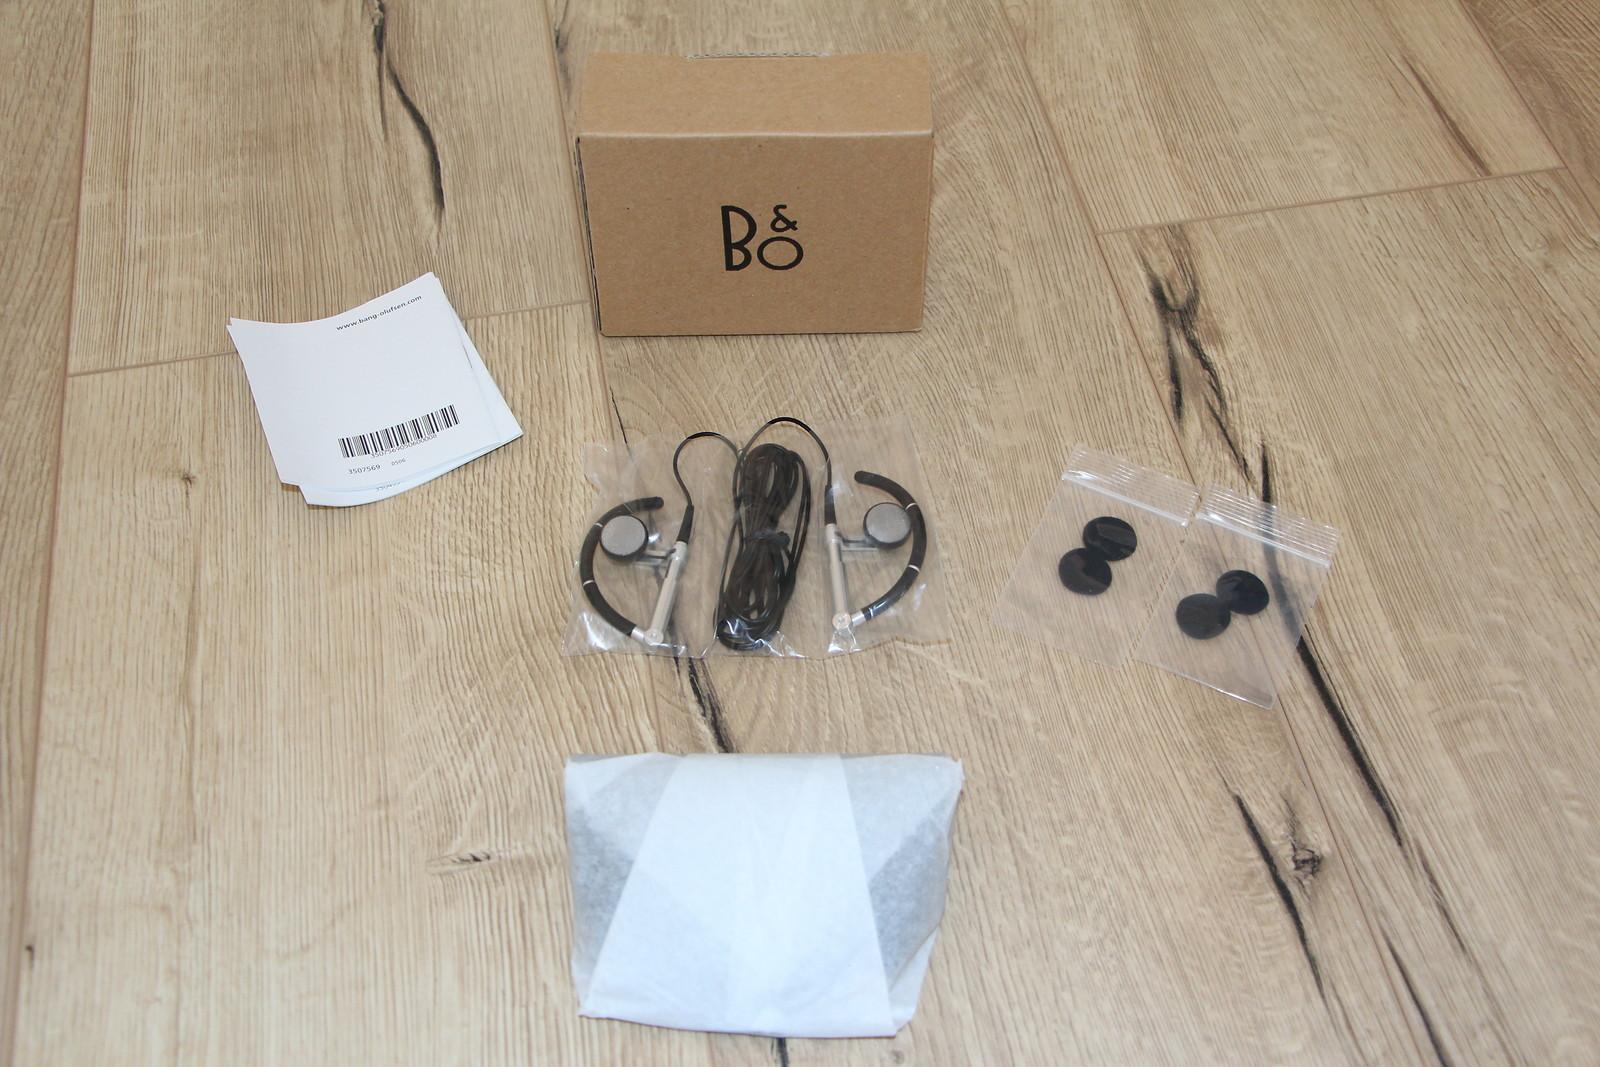 bang olufsen b o play in ear b gel kopfh rer beoplay earset 3i bikemarkt mtb. Black Bedroom Furniture Sets. Home Design Ideas